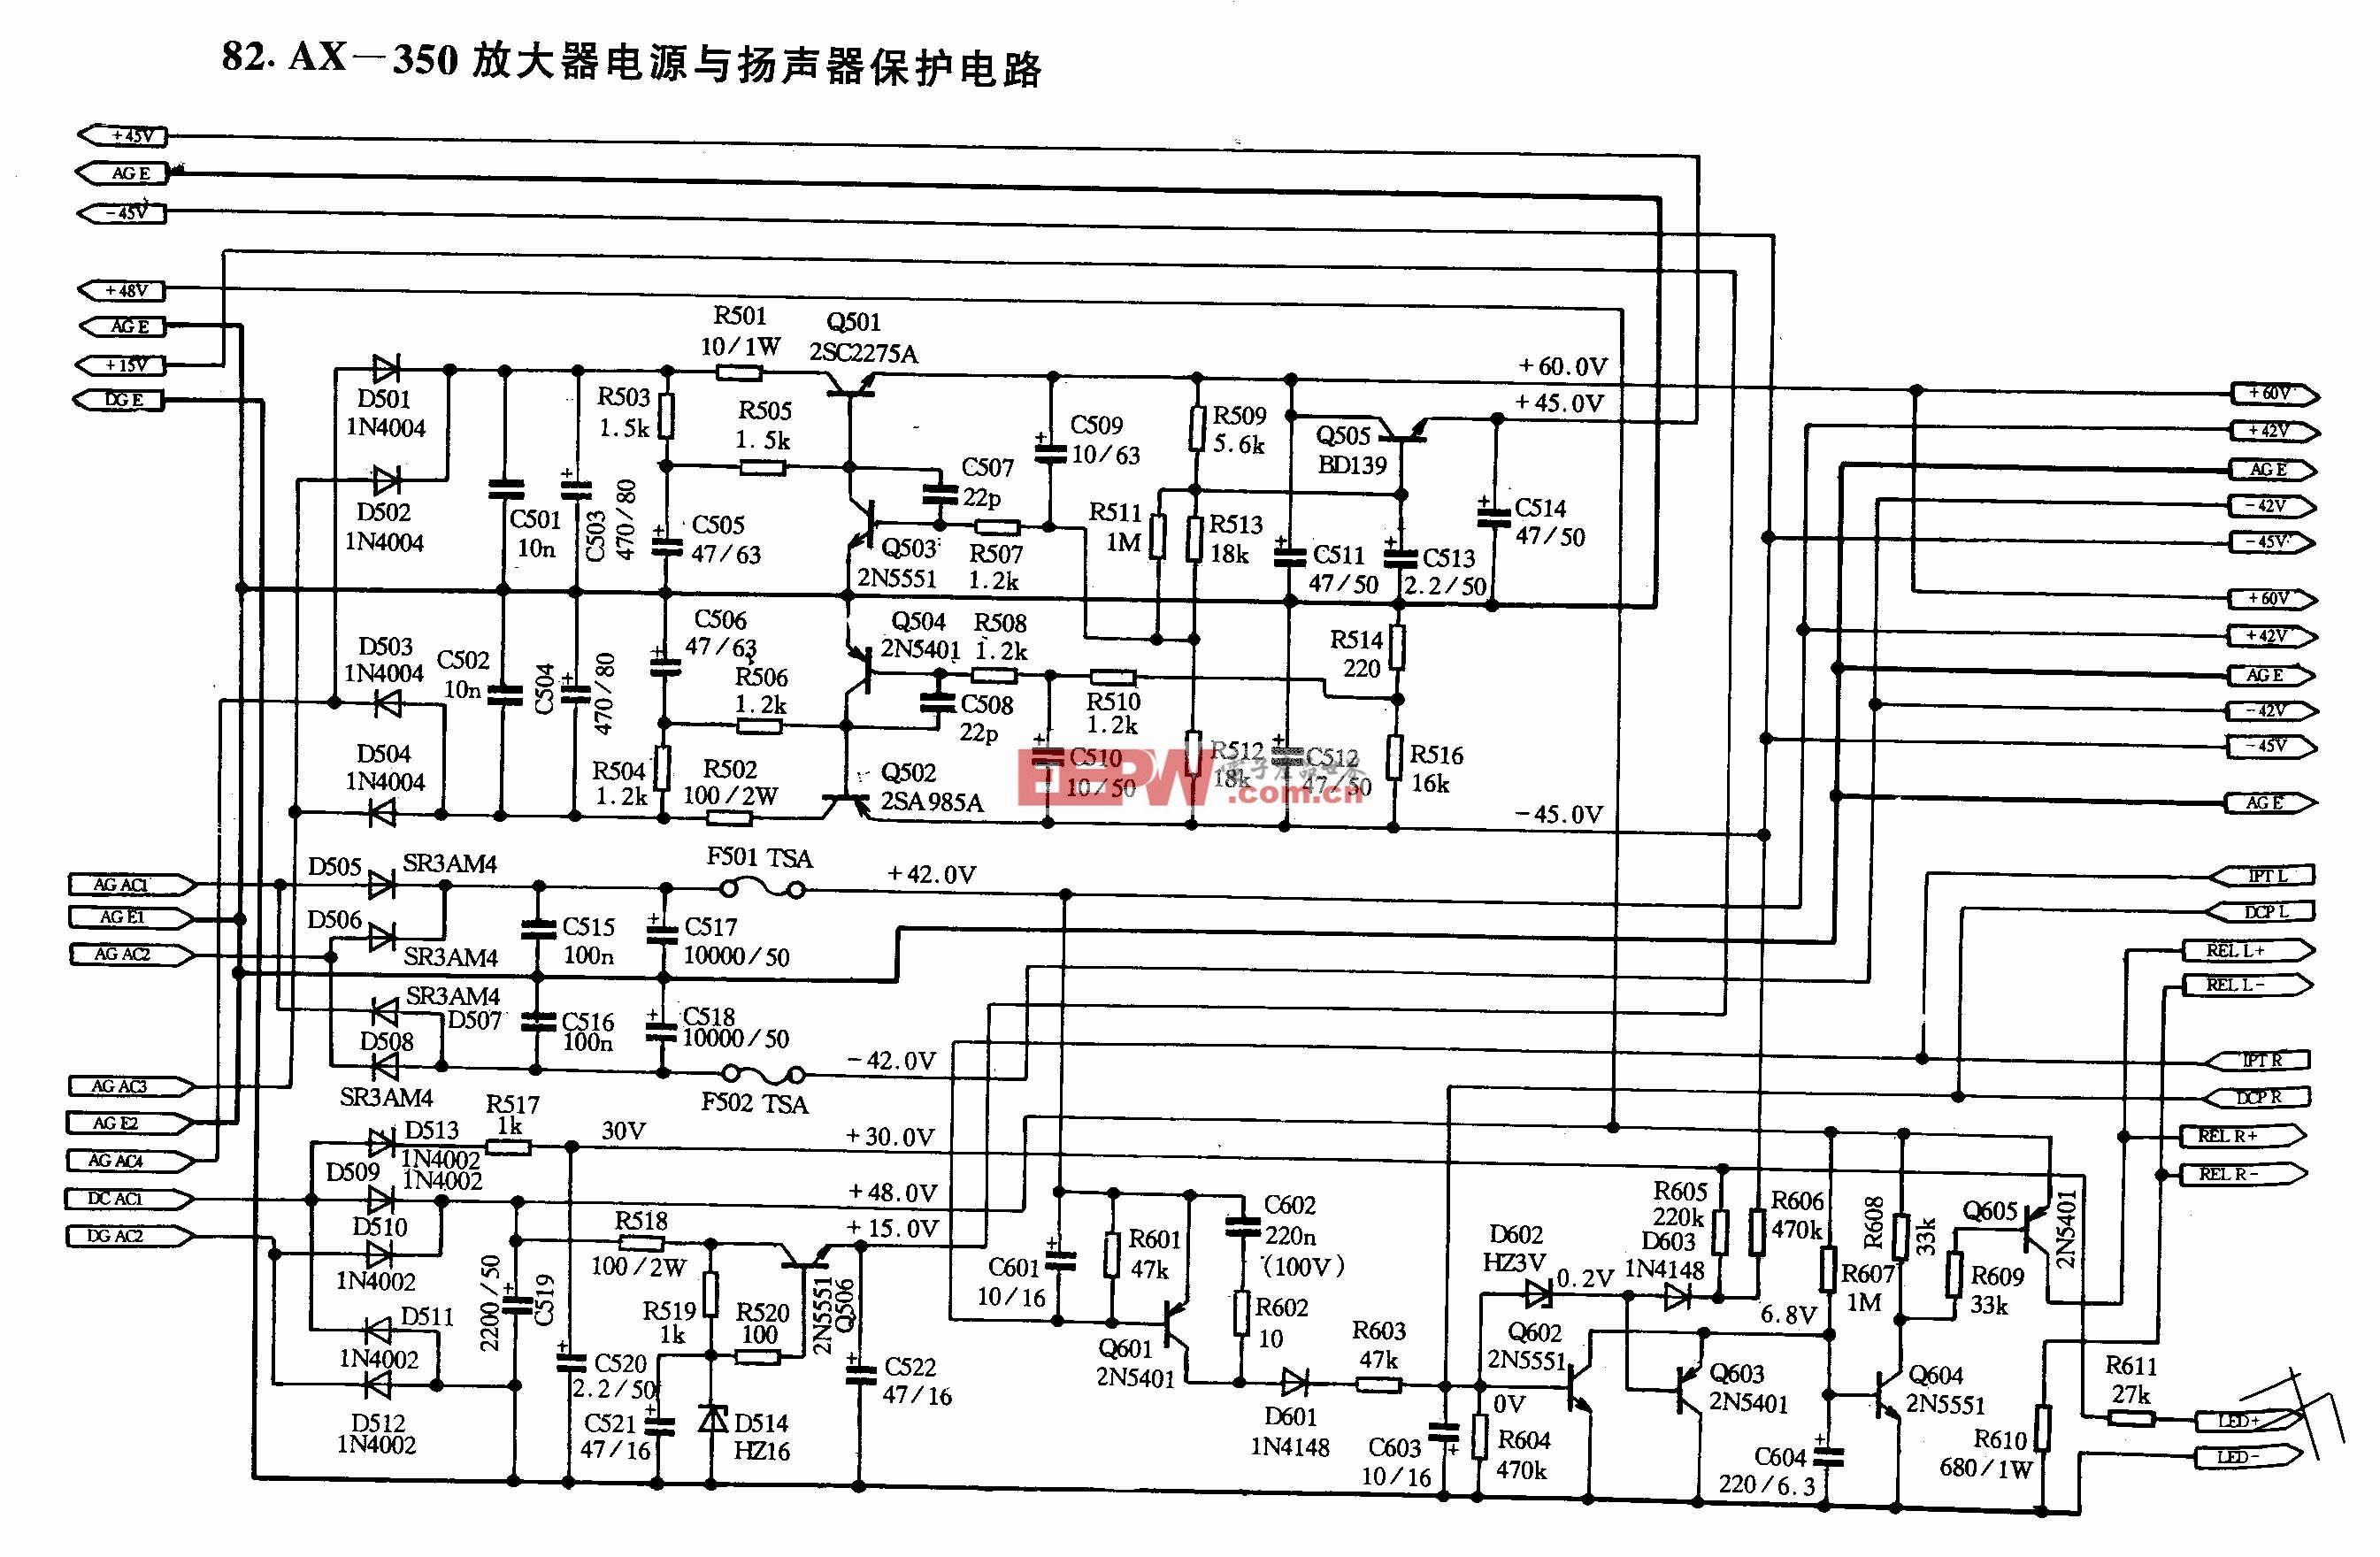 AX-350放大器电源与扬声器保护电路